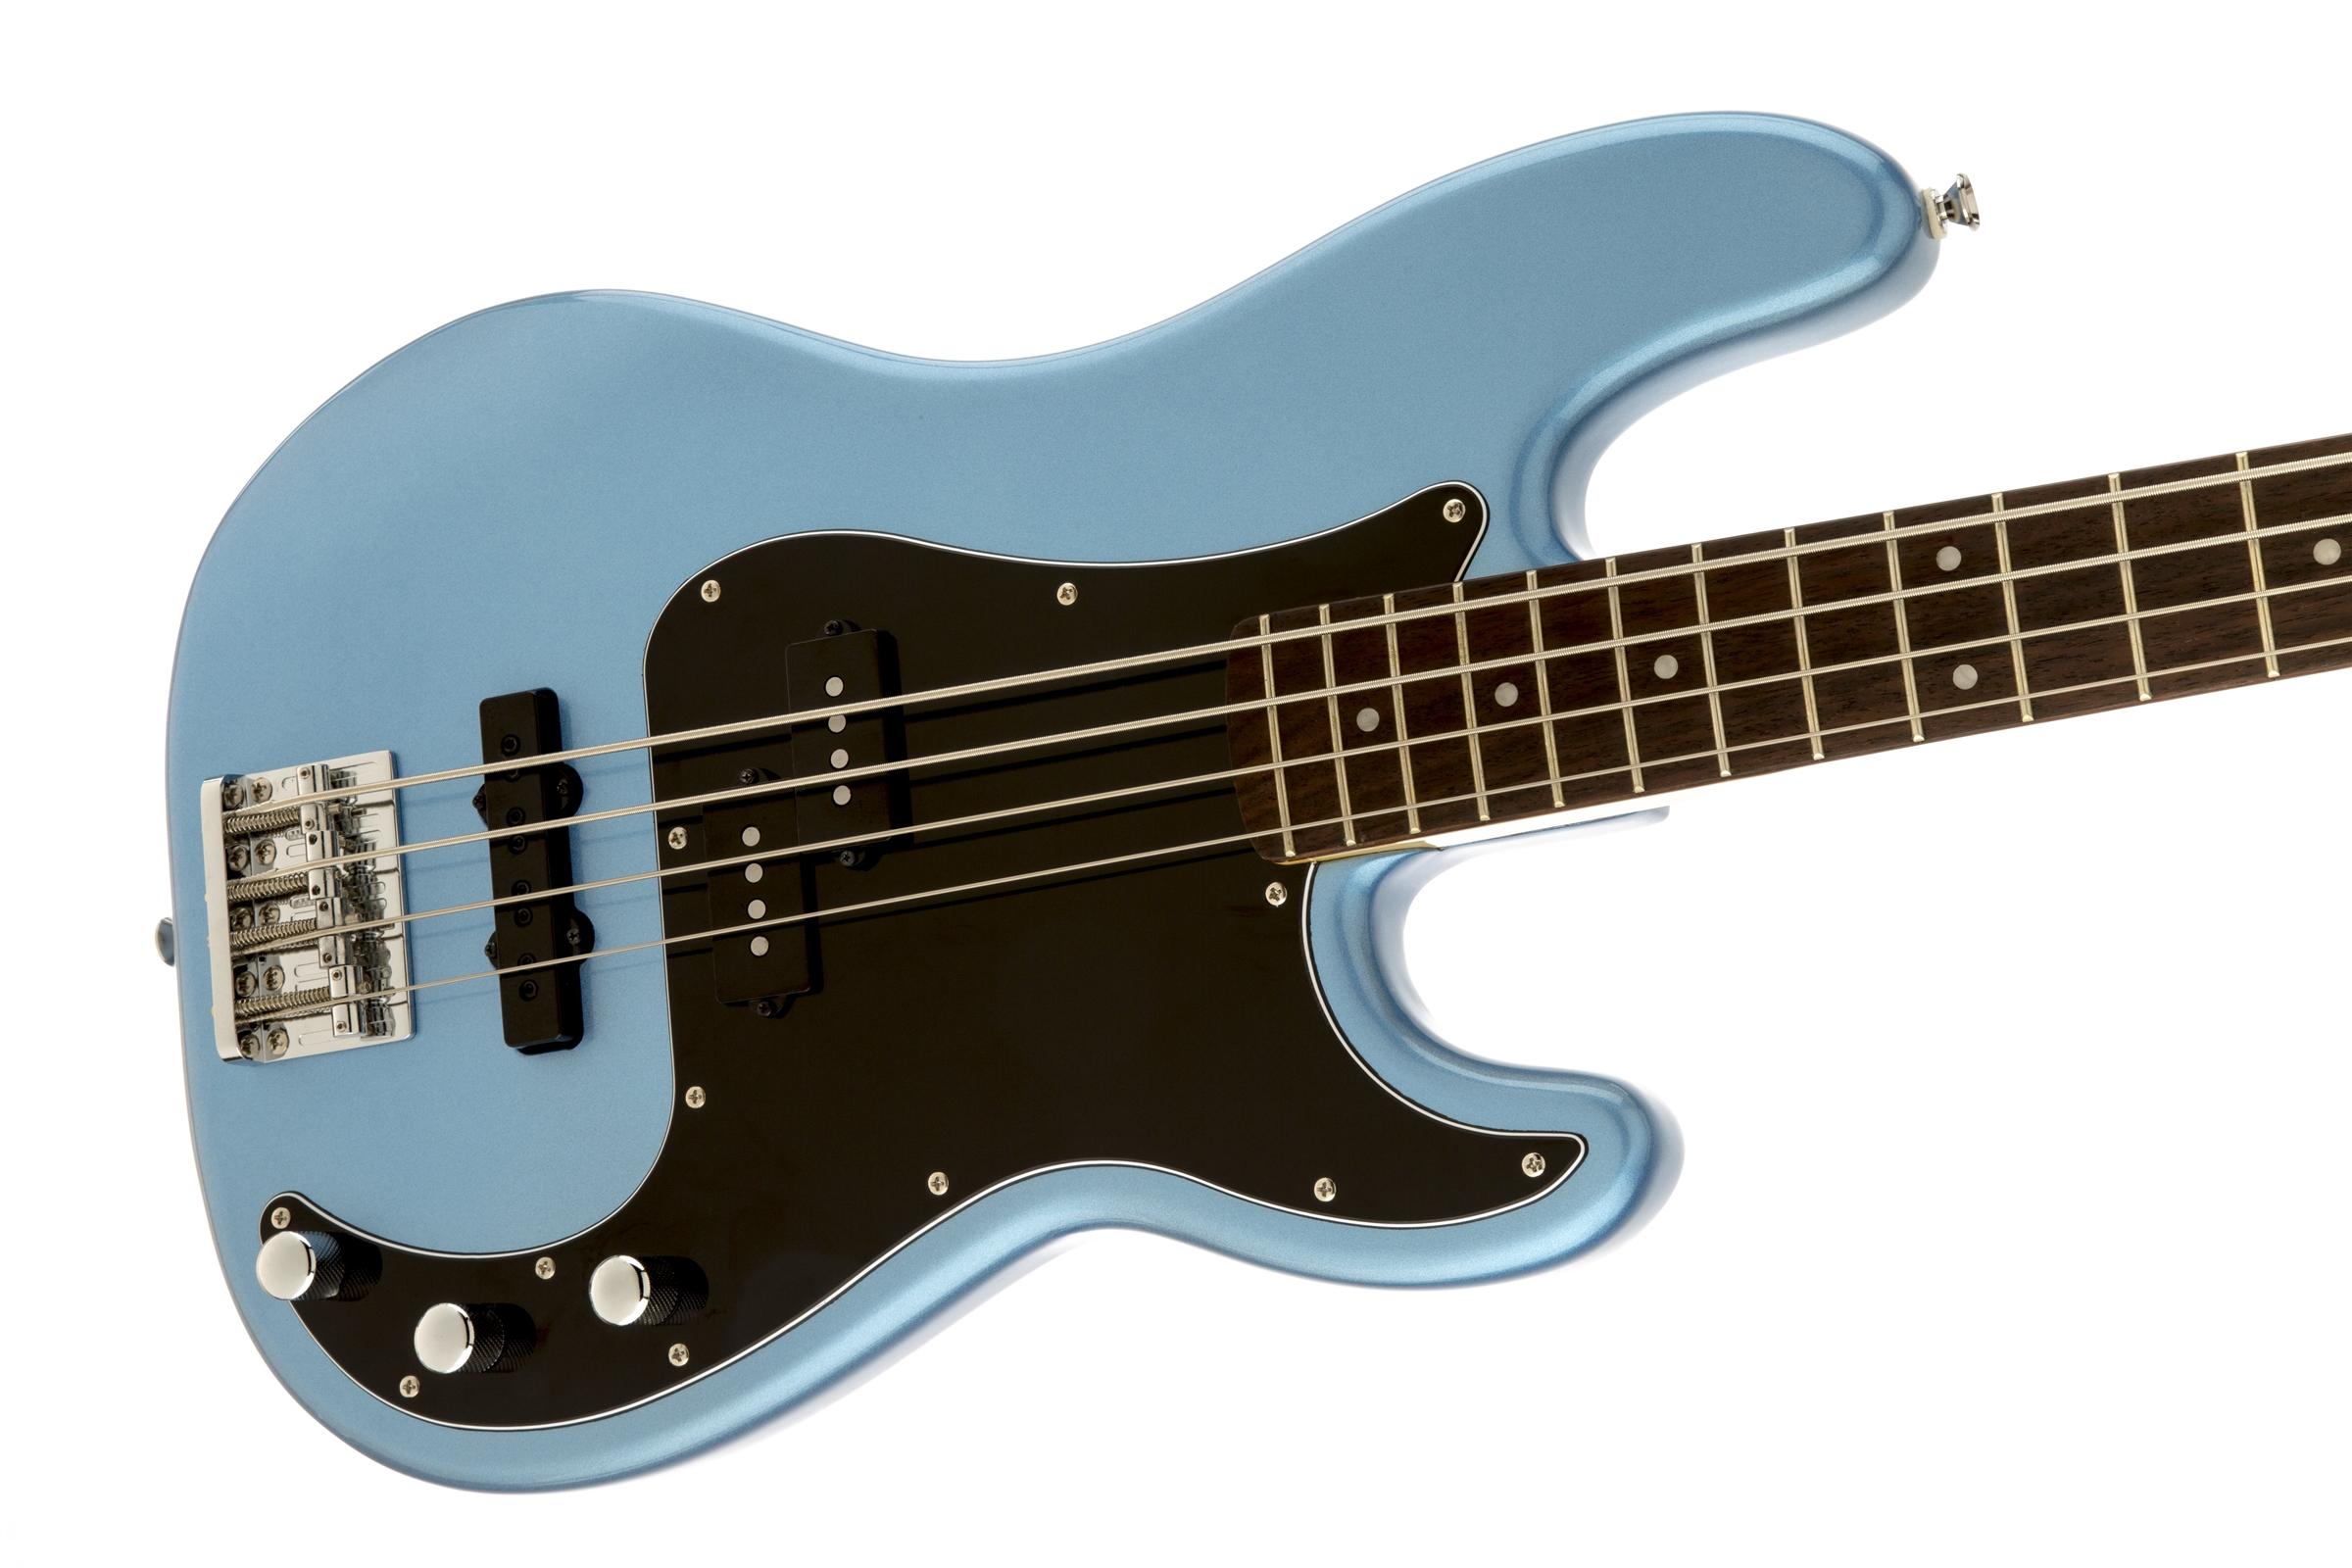 Squier U00ae Vintage Modified Precision Bass U00ae Pj  Rosewood